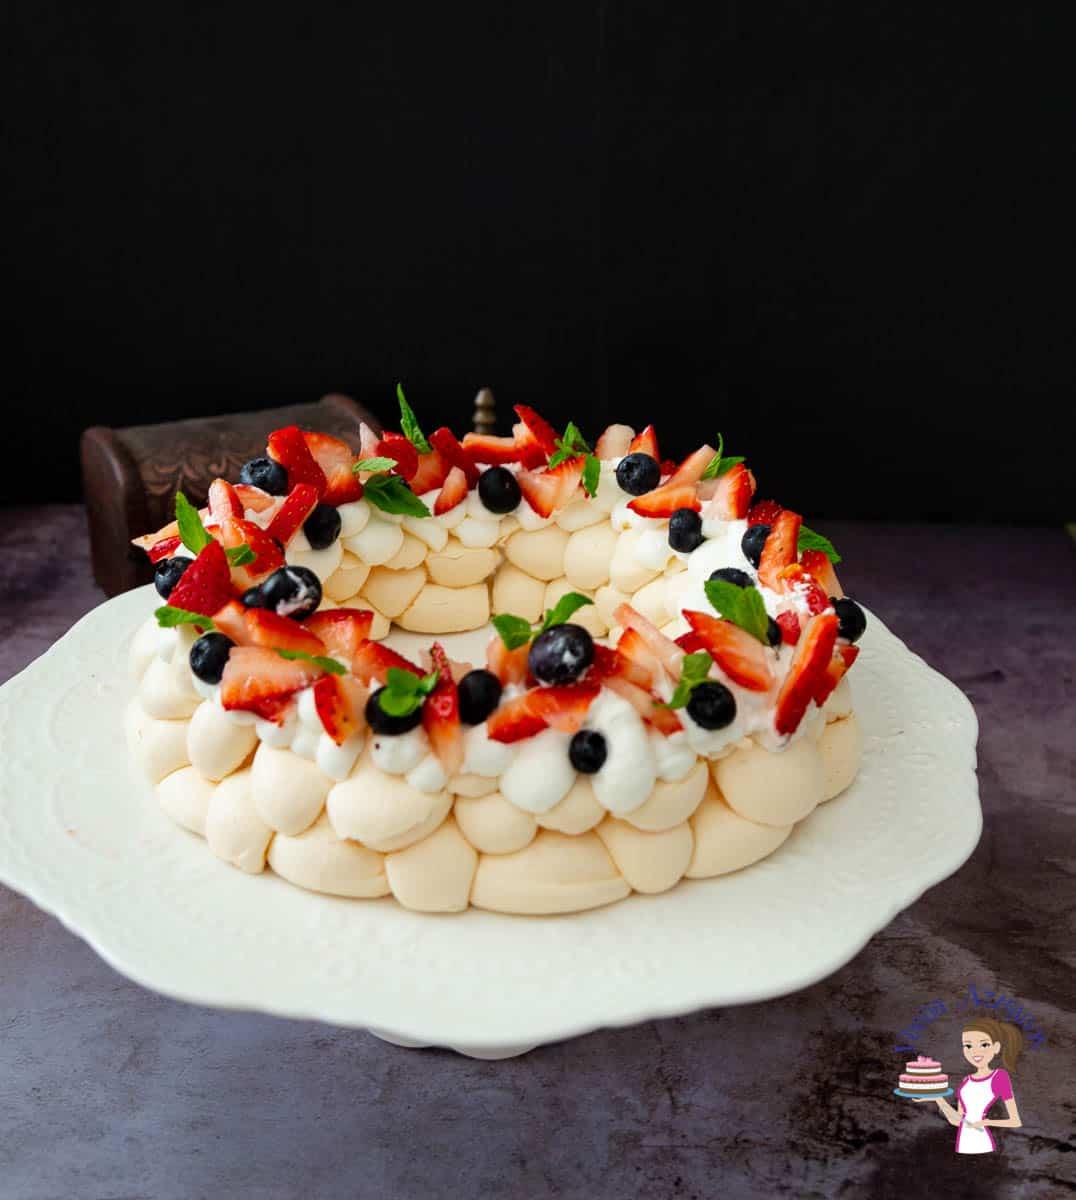 Assembled pavlova on a cake stand